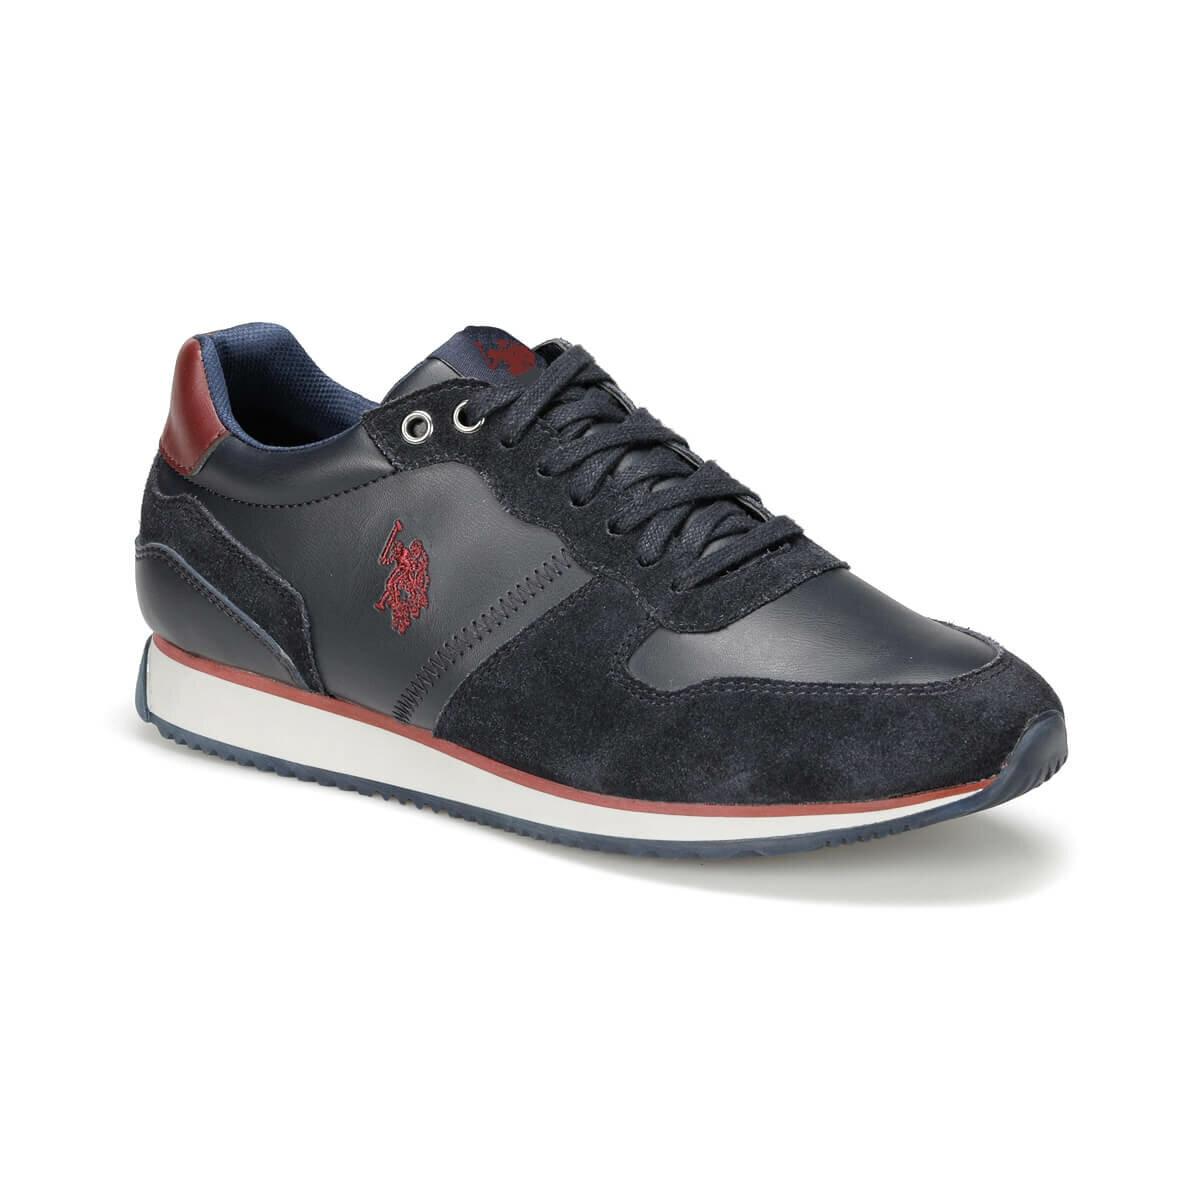 FLO MAC WT 9PR Navy Blue Men 'S Shoes U.S. POLO ASSN.